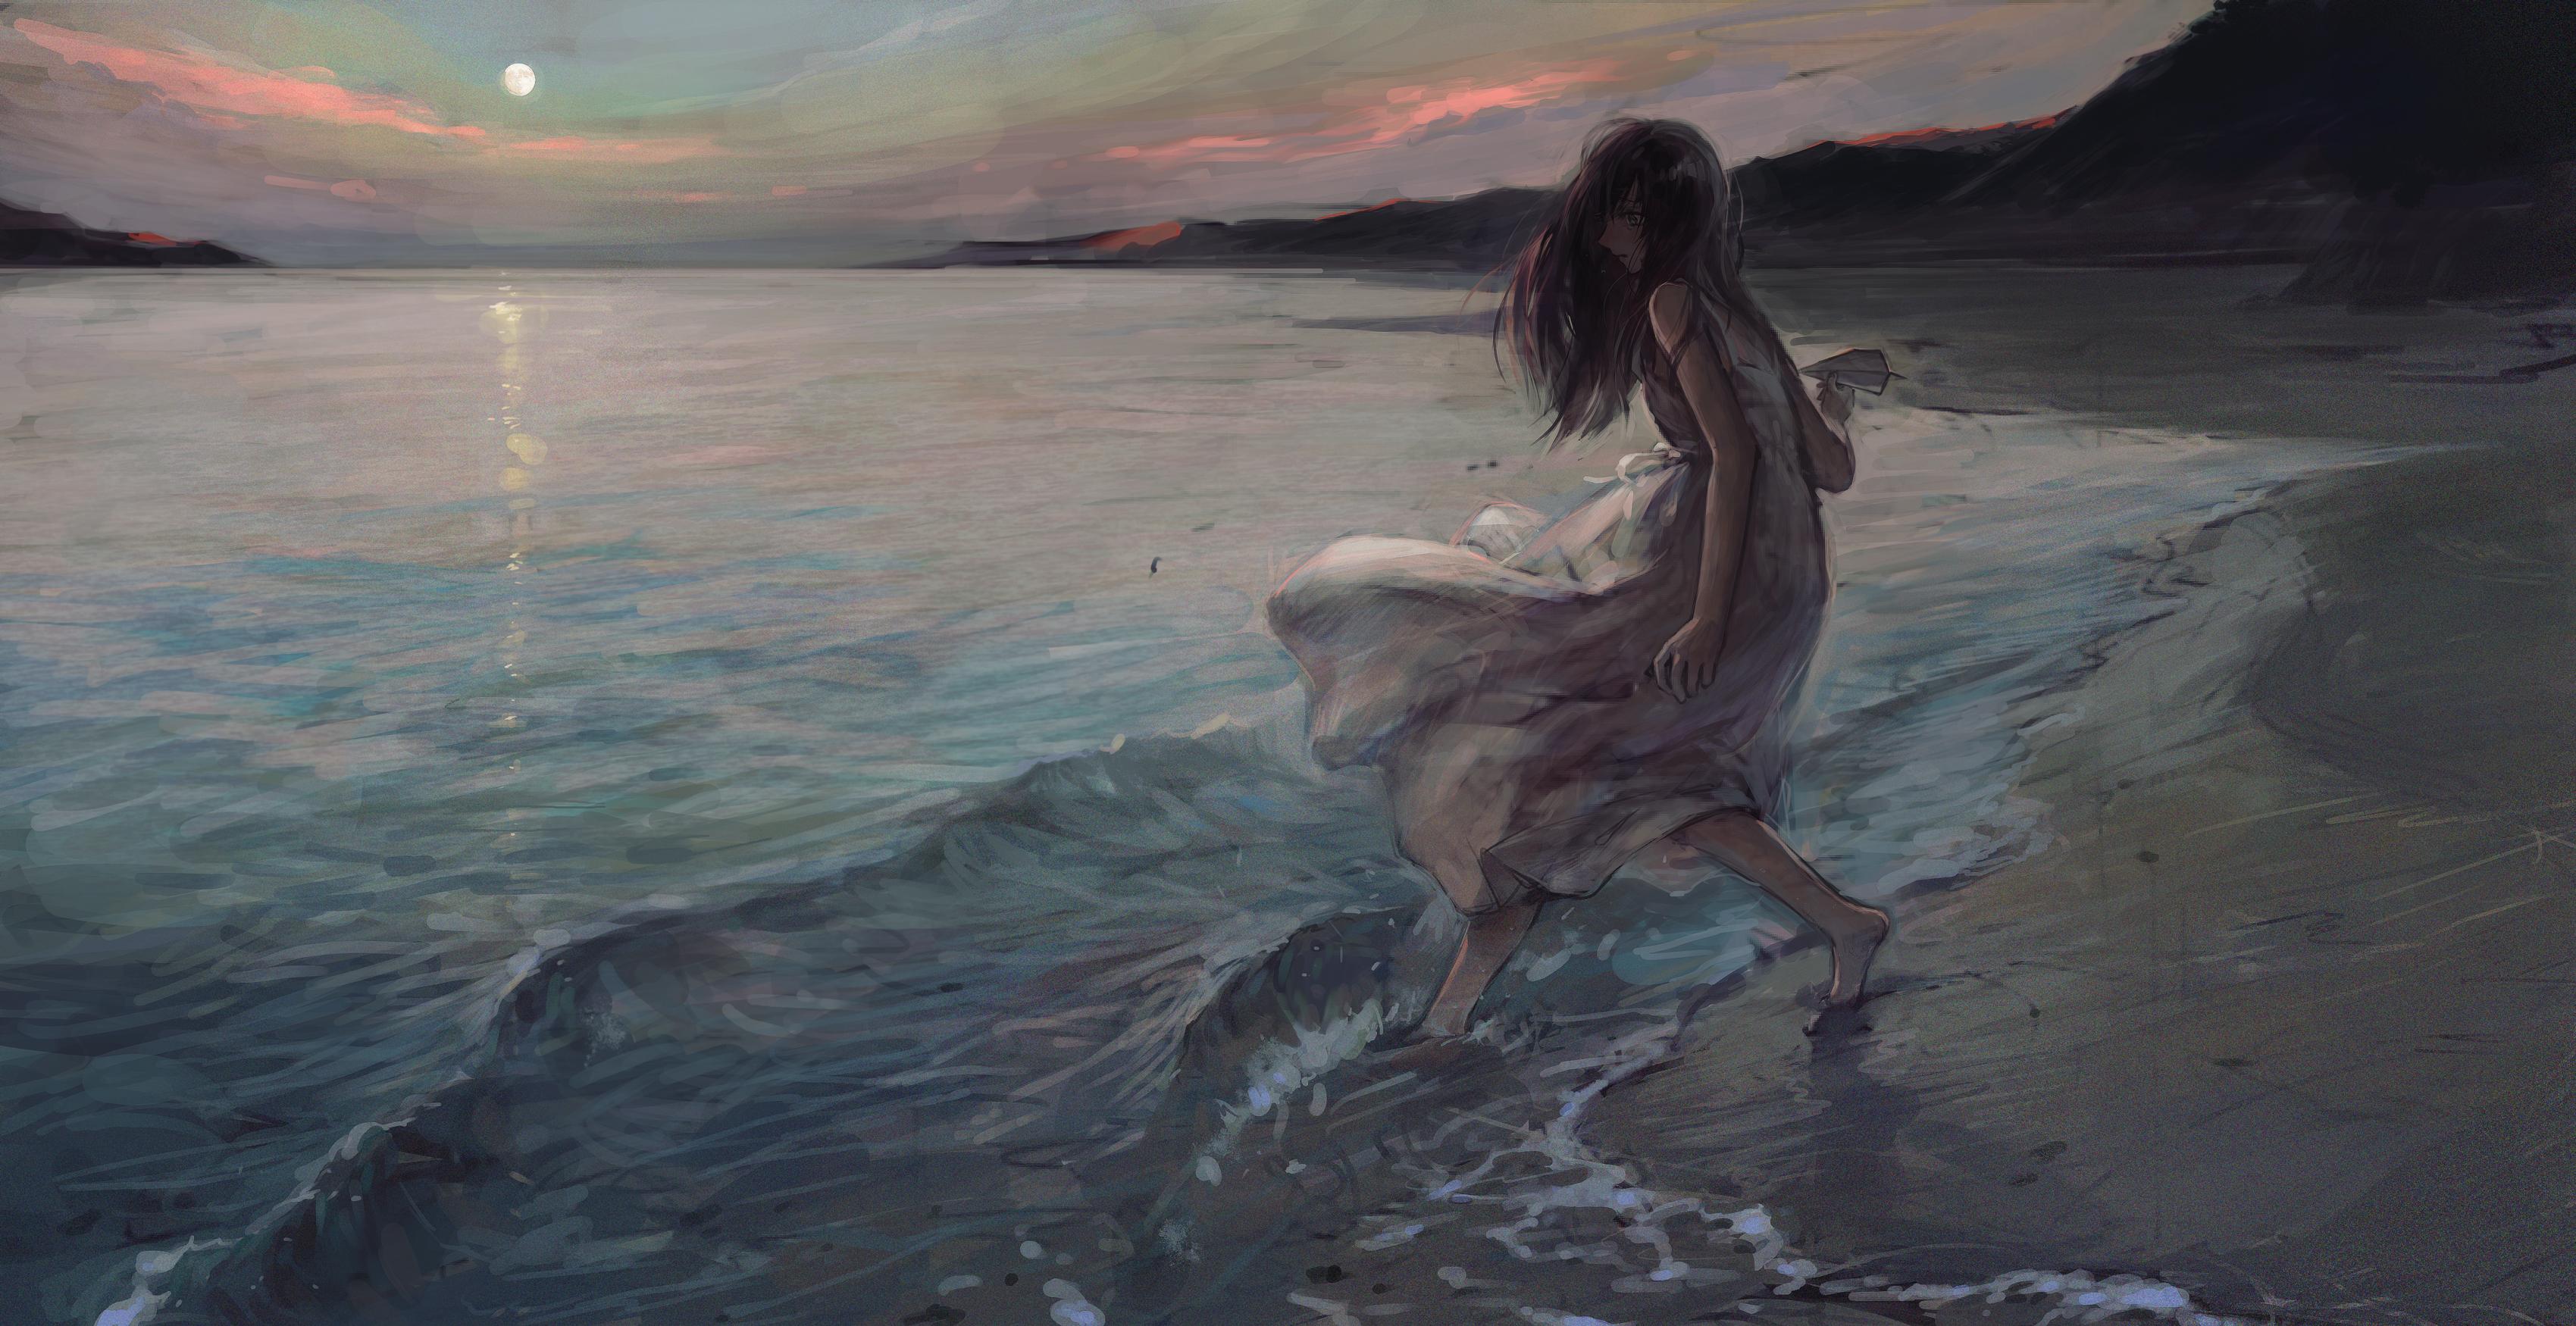 Anime Tentwo Anime Girls Beach Barefoot Dress Sun Dress Dark Hair 3399x1750